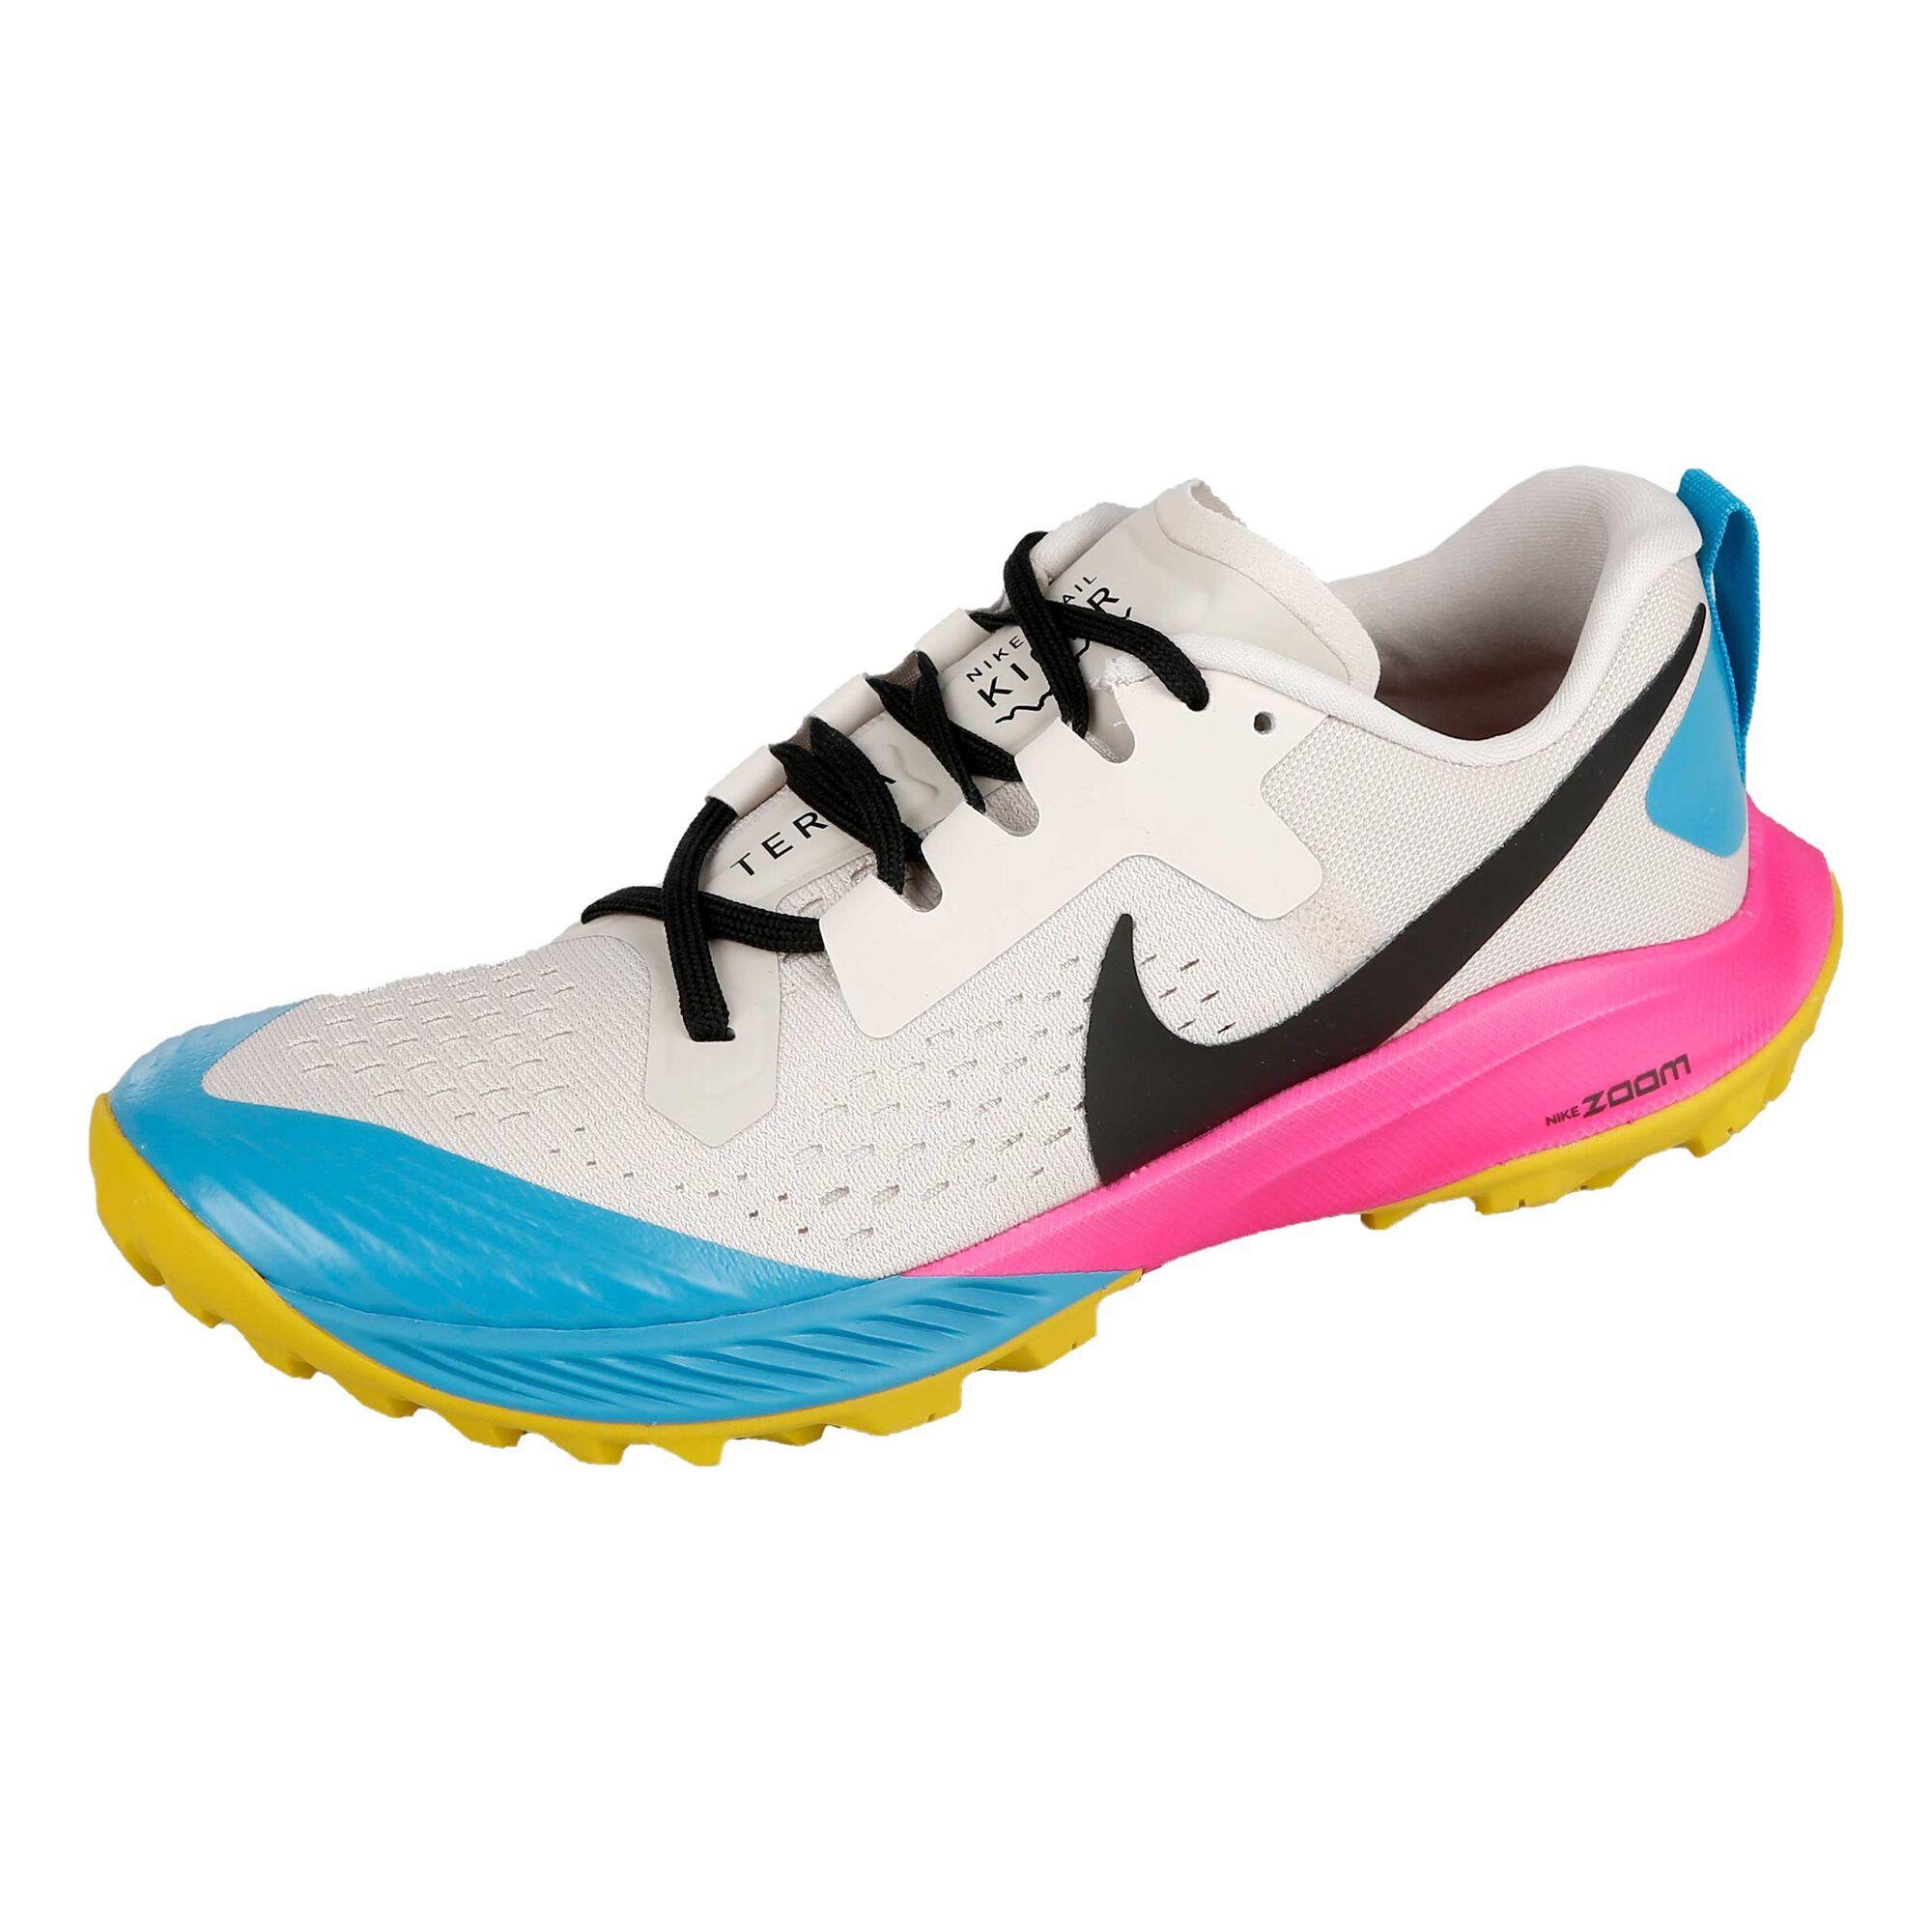 067e6d11e1216 buy Nike Terra Kiger 5 Neutral Running Shoe Women - Beige, Black ...